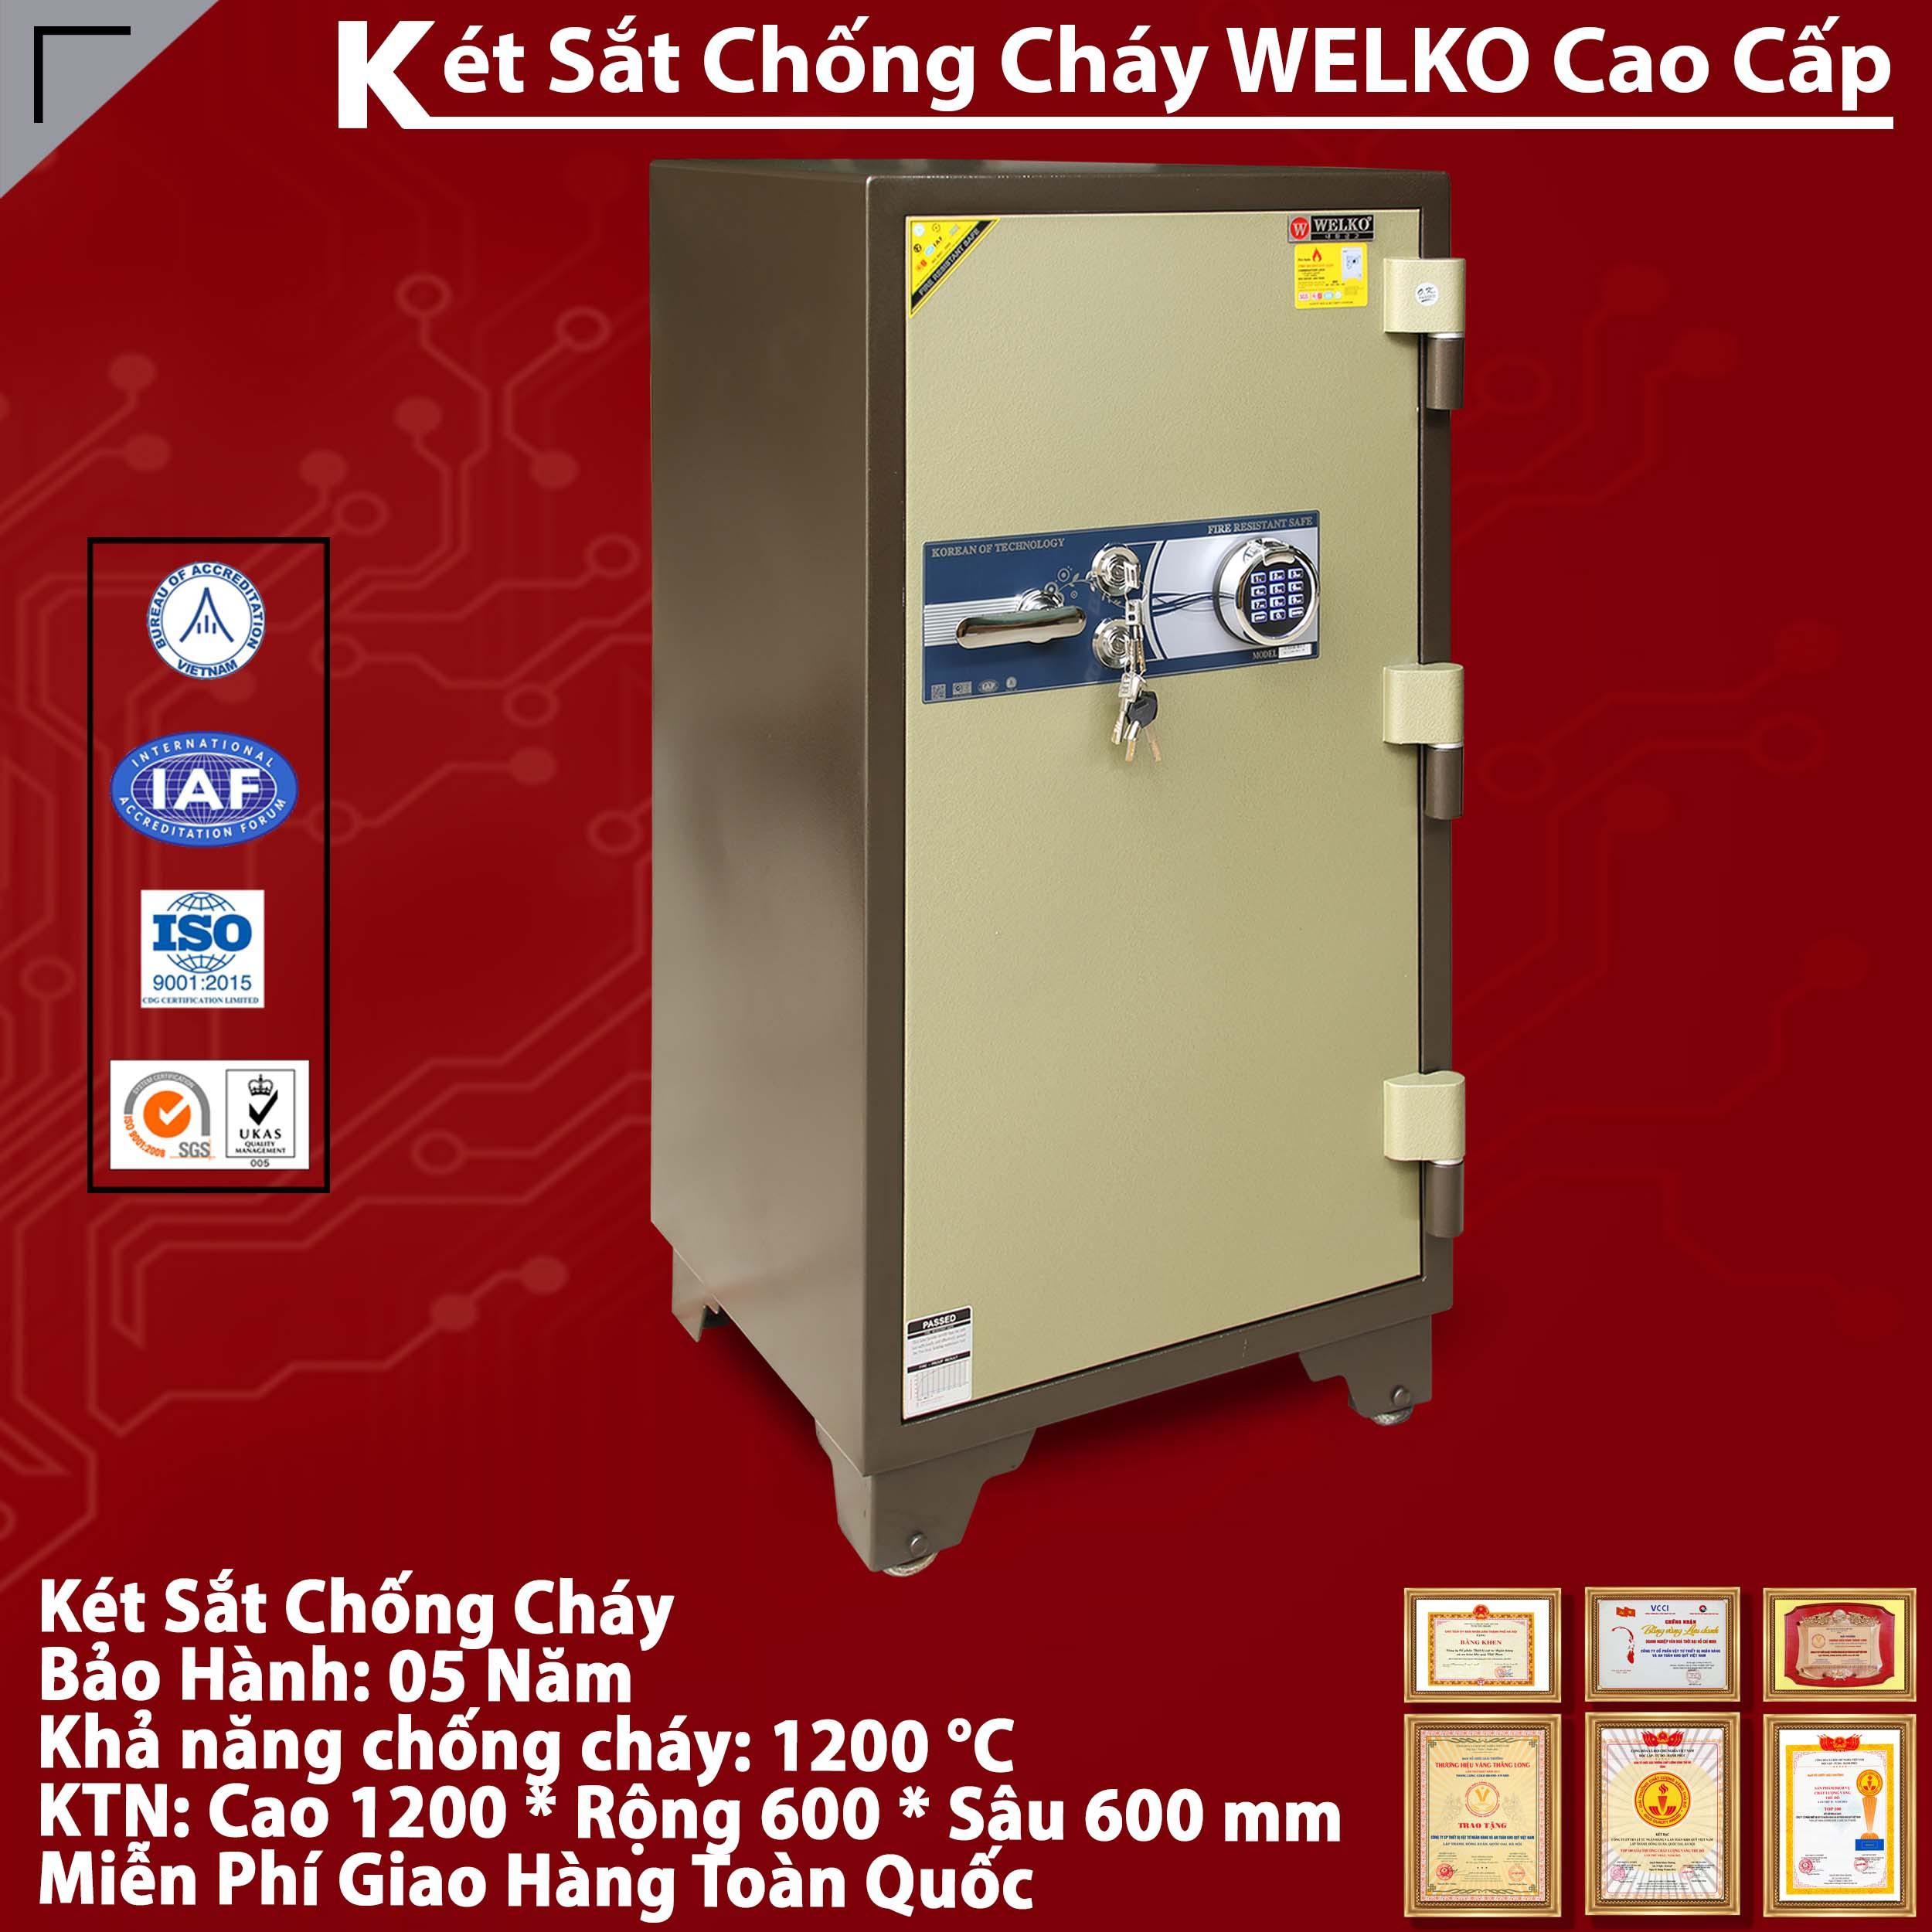 Ket sat Welko chinh hang